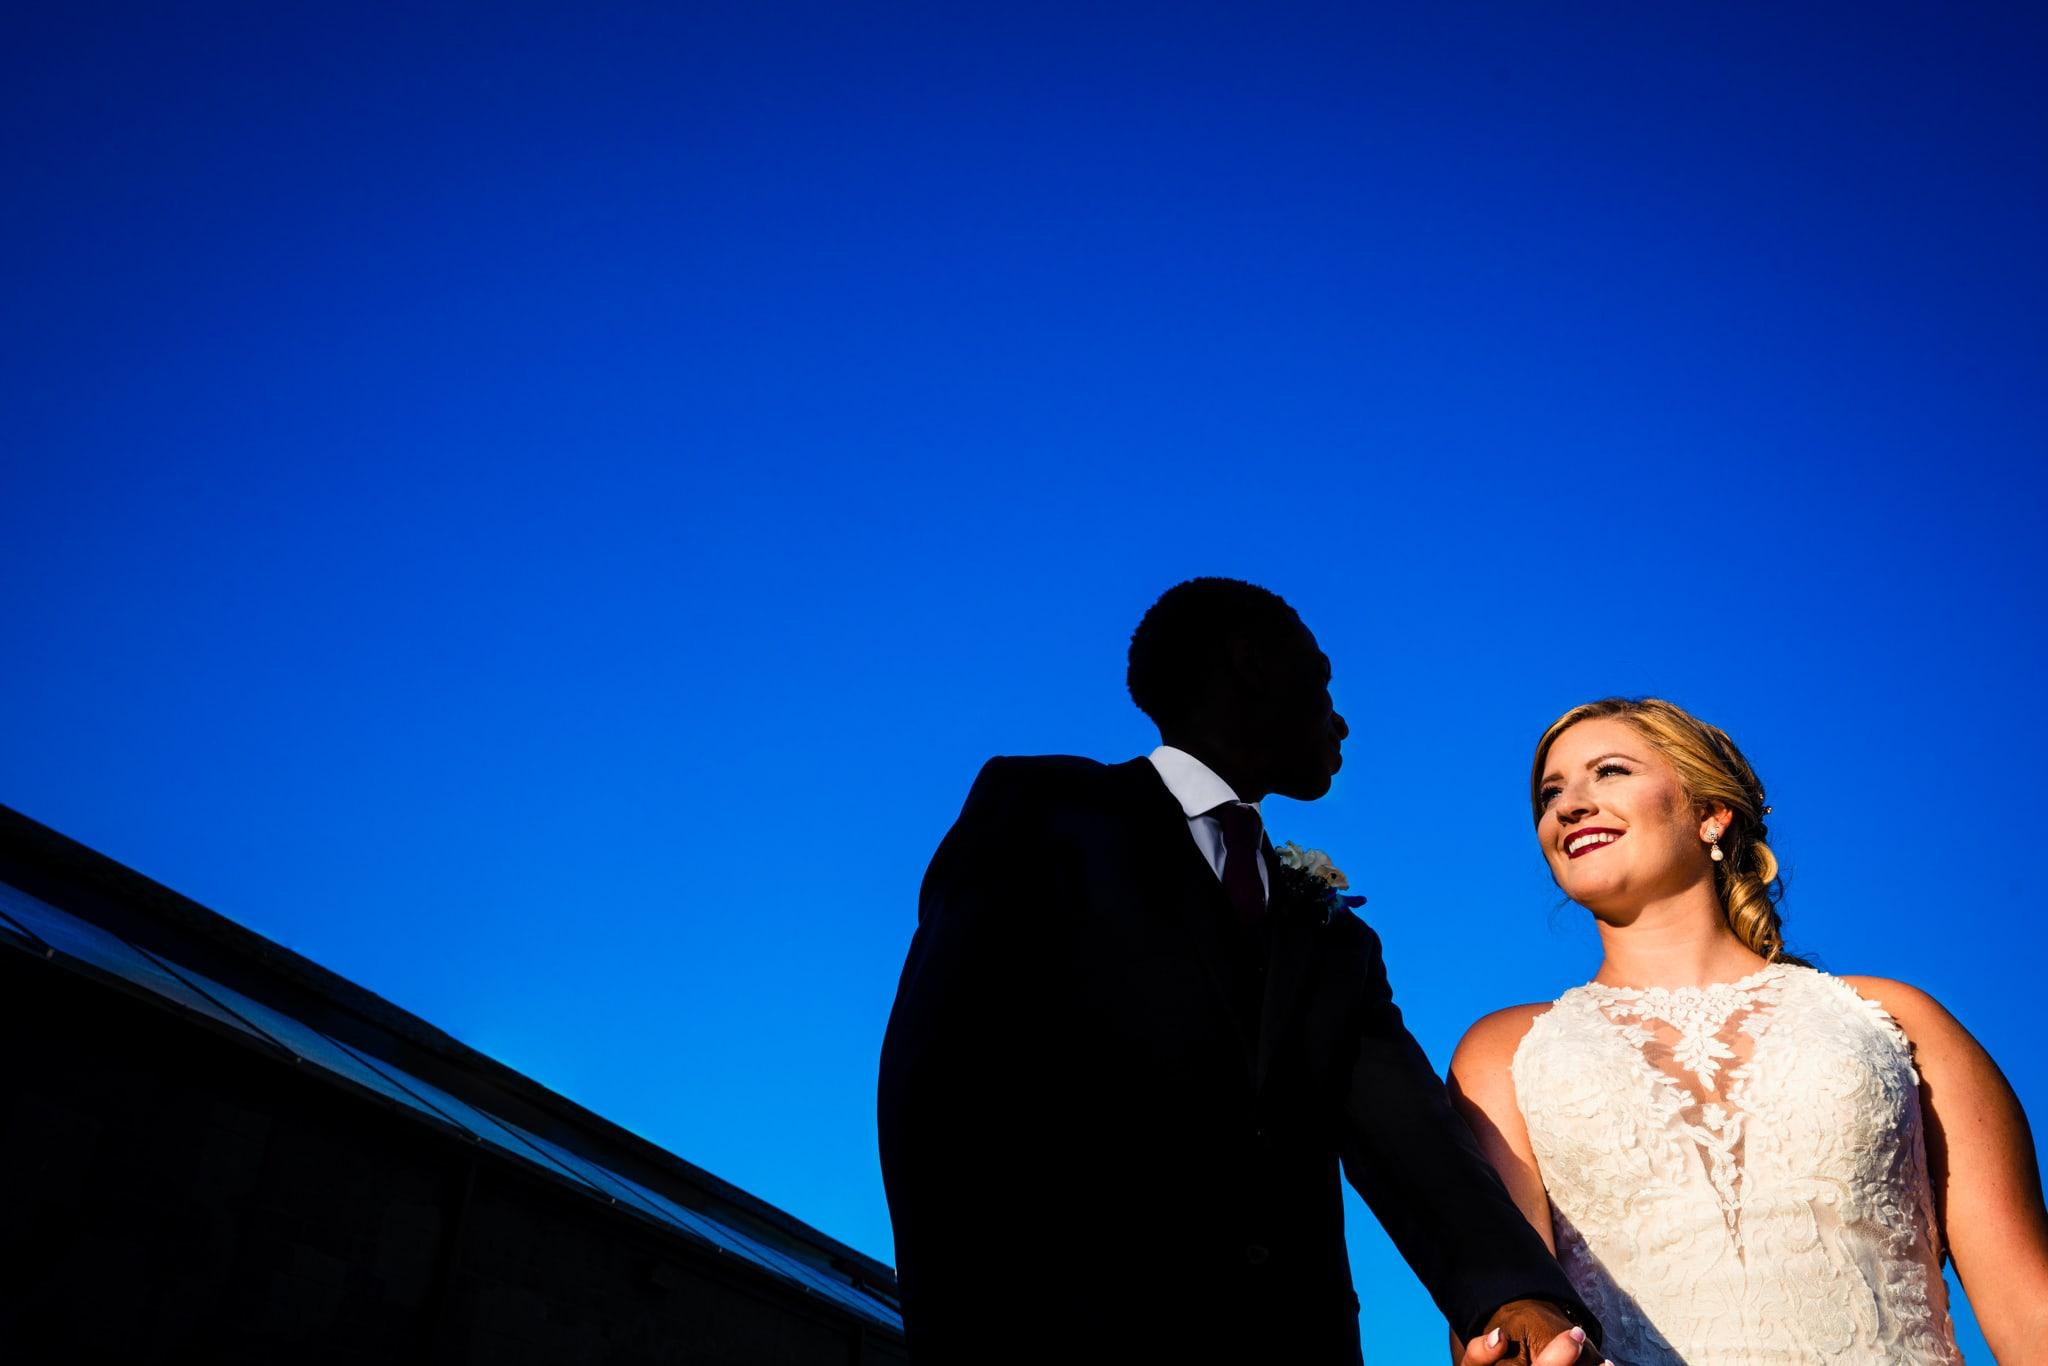 Downtown Dayton Wedding Venues - Gem City